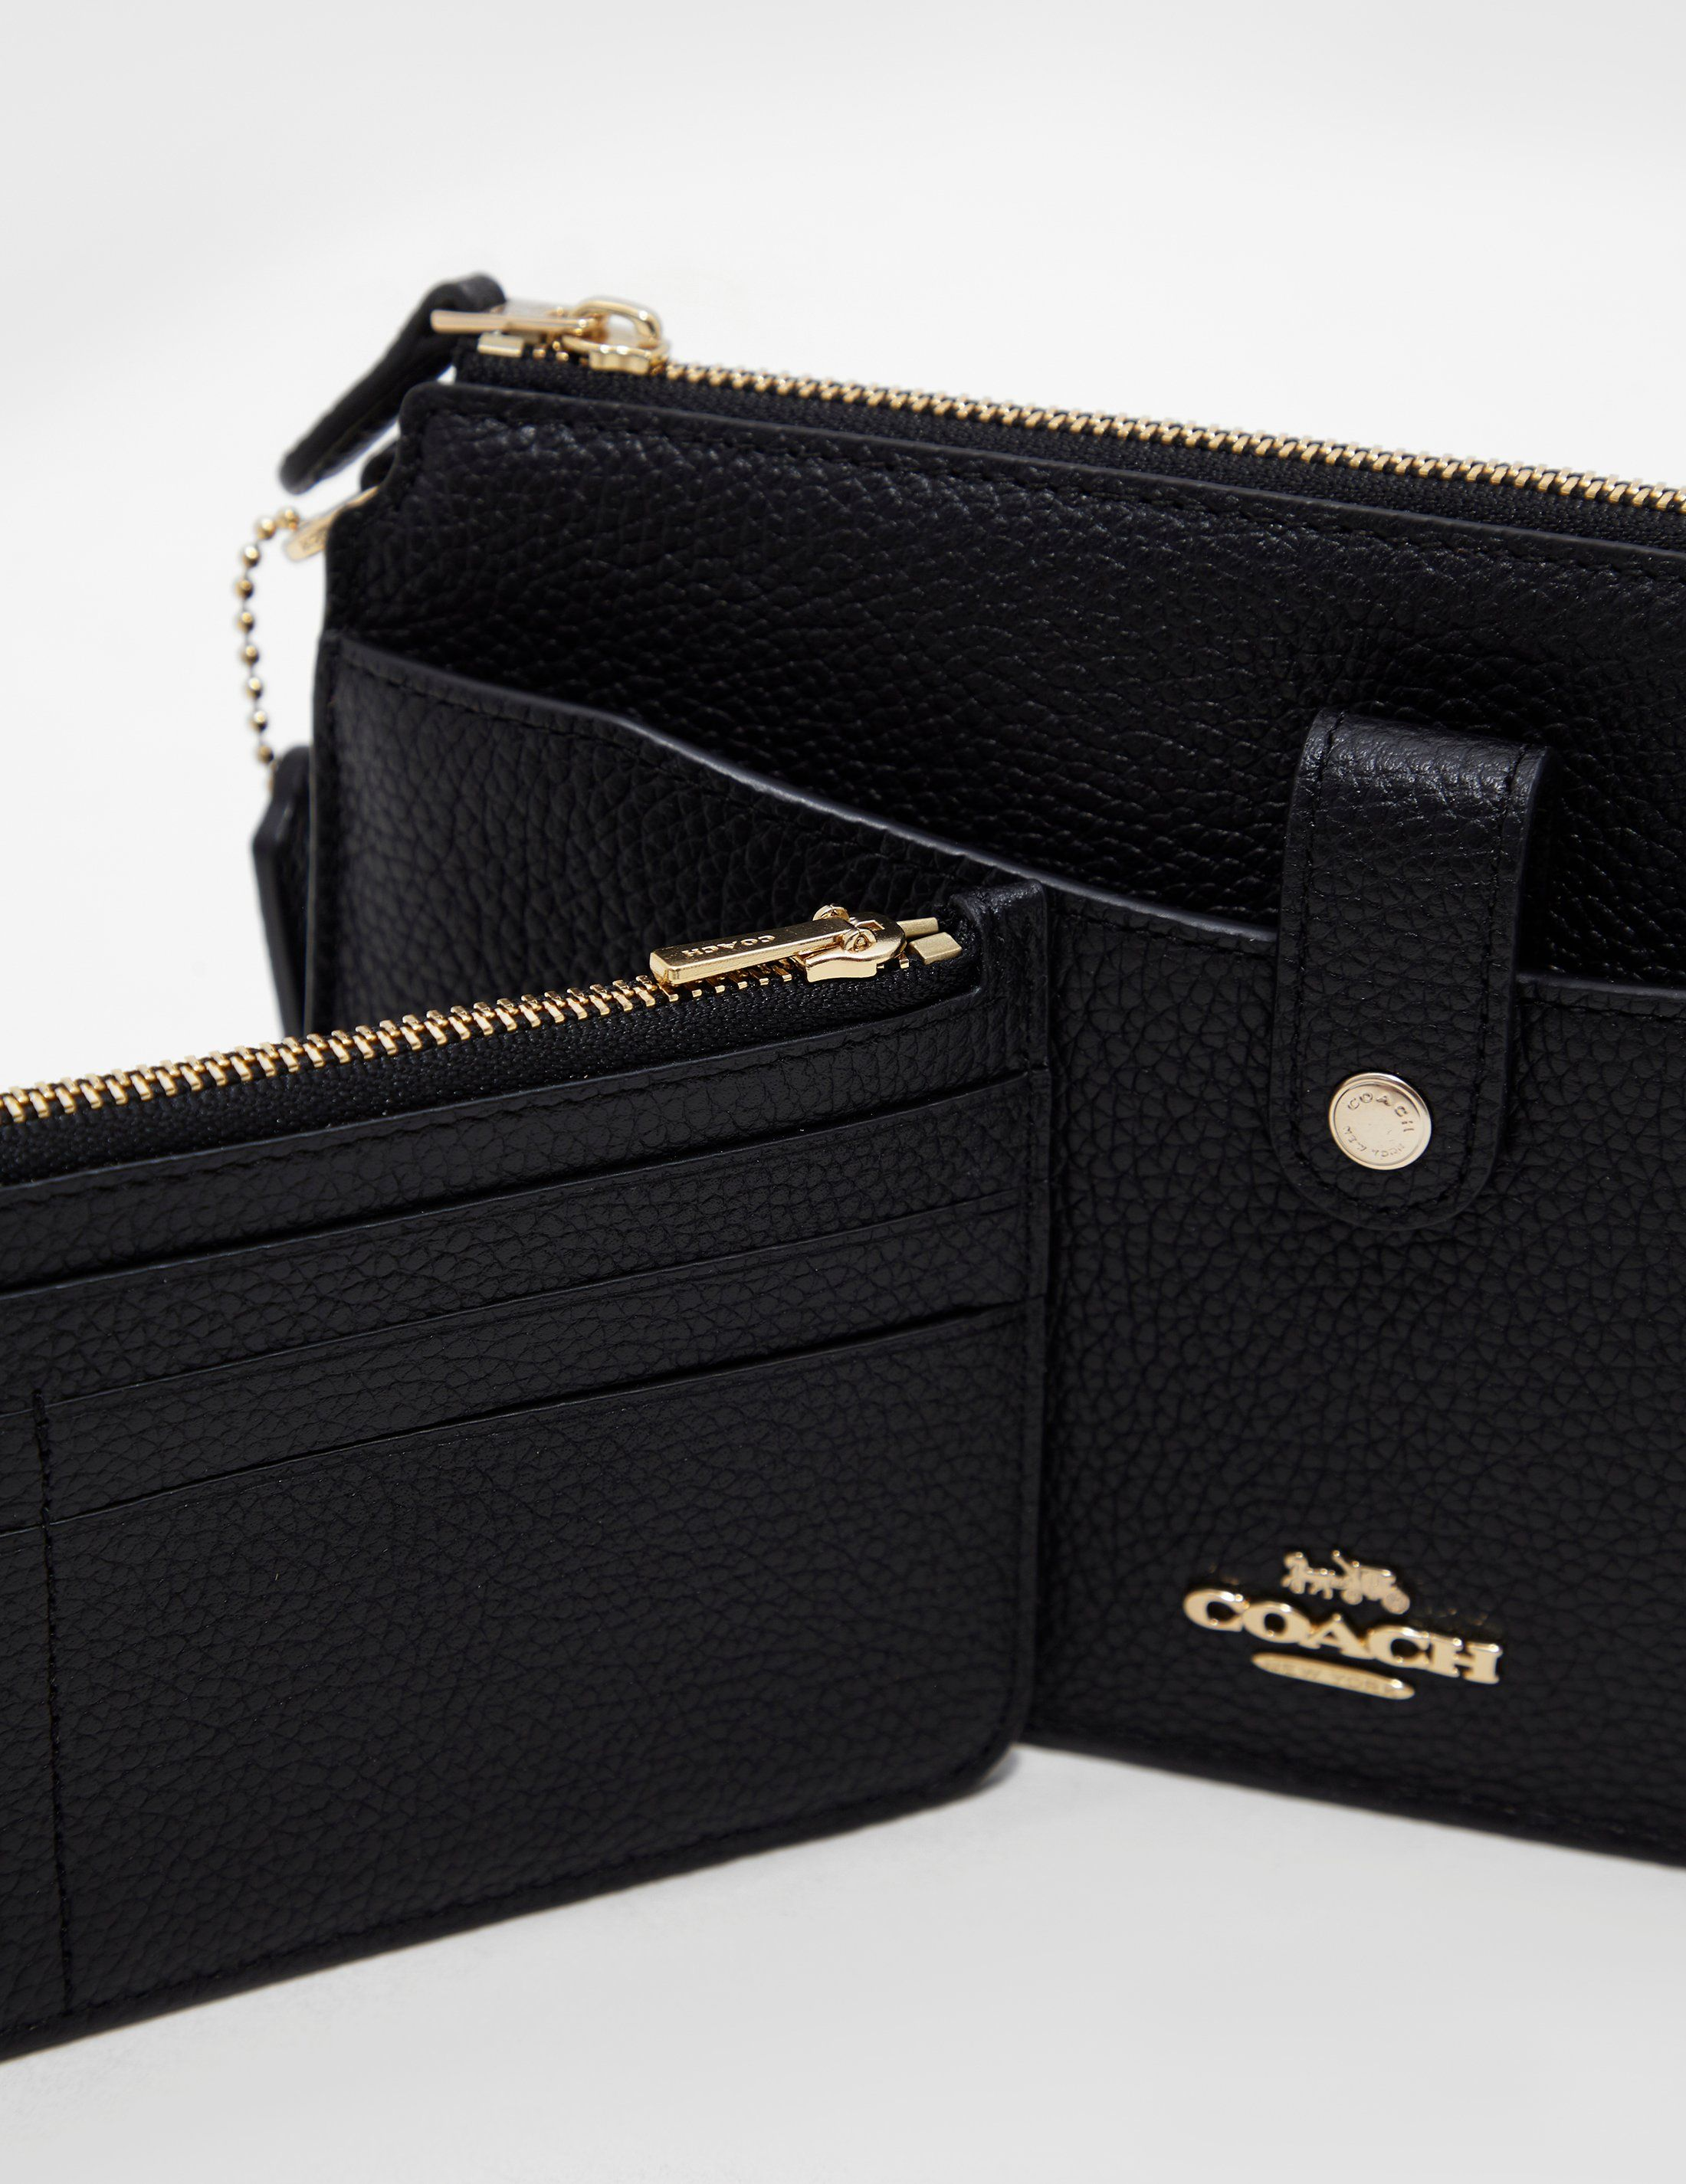 COACH Pop Up Messenger Shoulder Bag - Online Exclusive